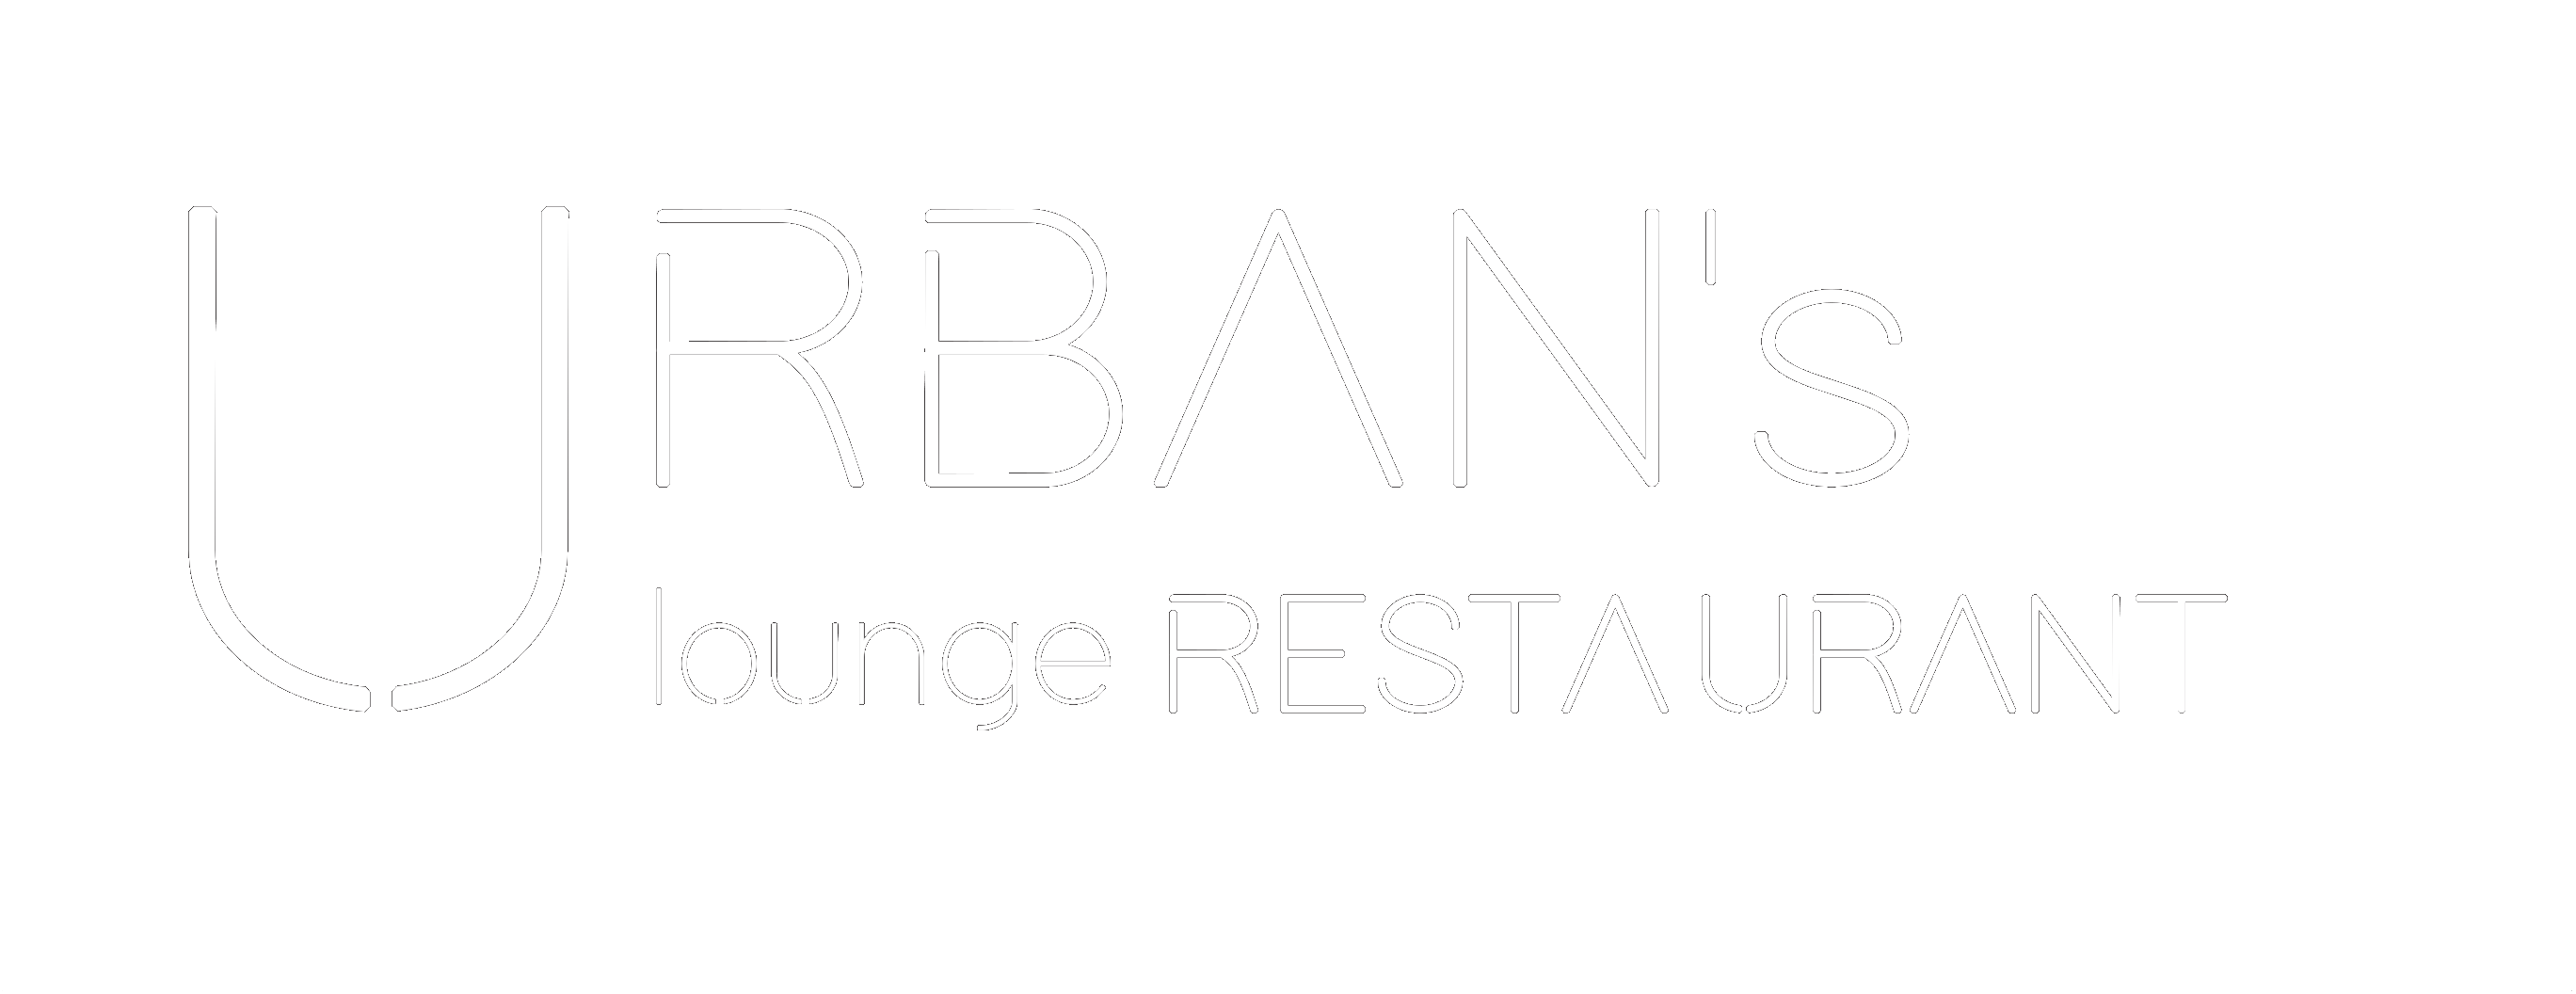 URBAN's Lounge Restaurant